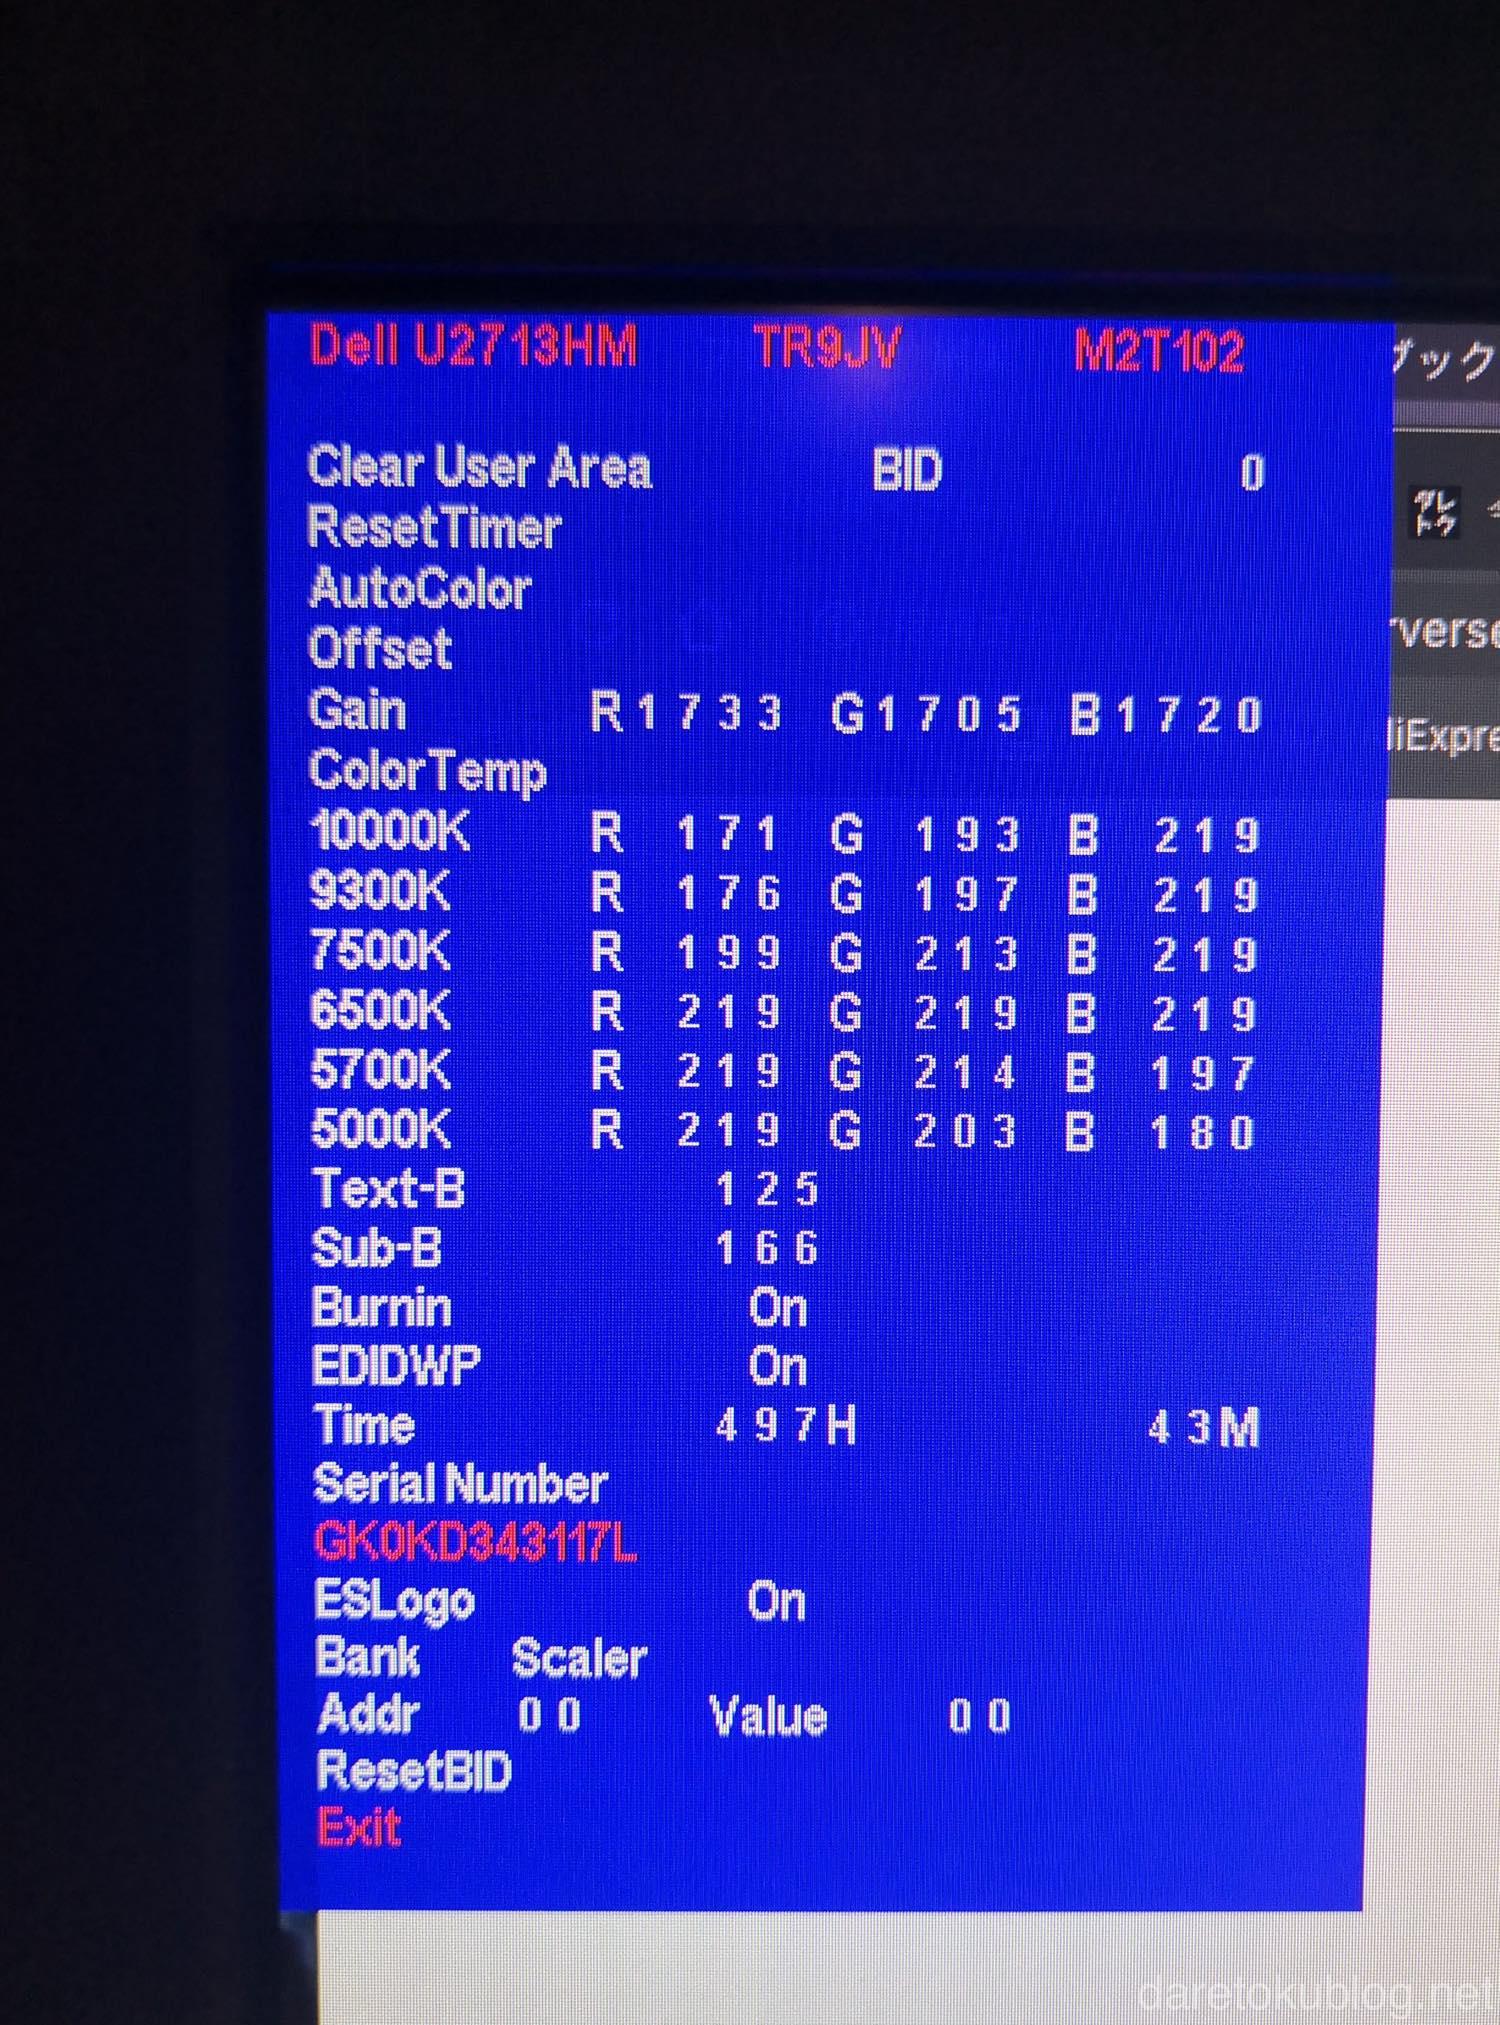 U2713HM ファクトリーモード